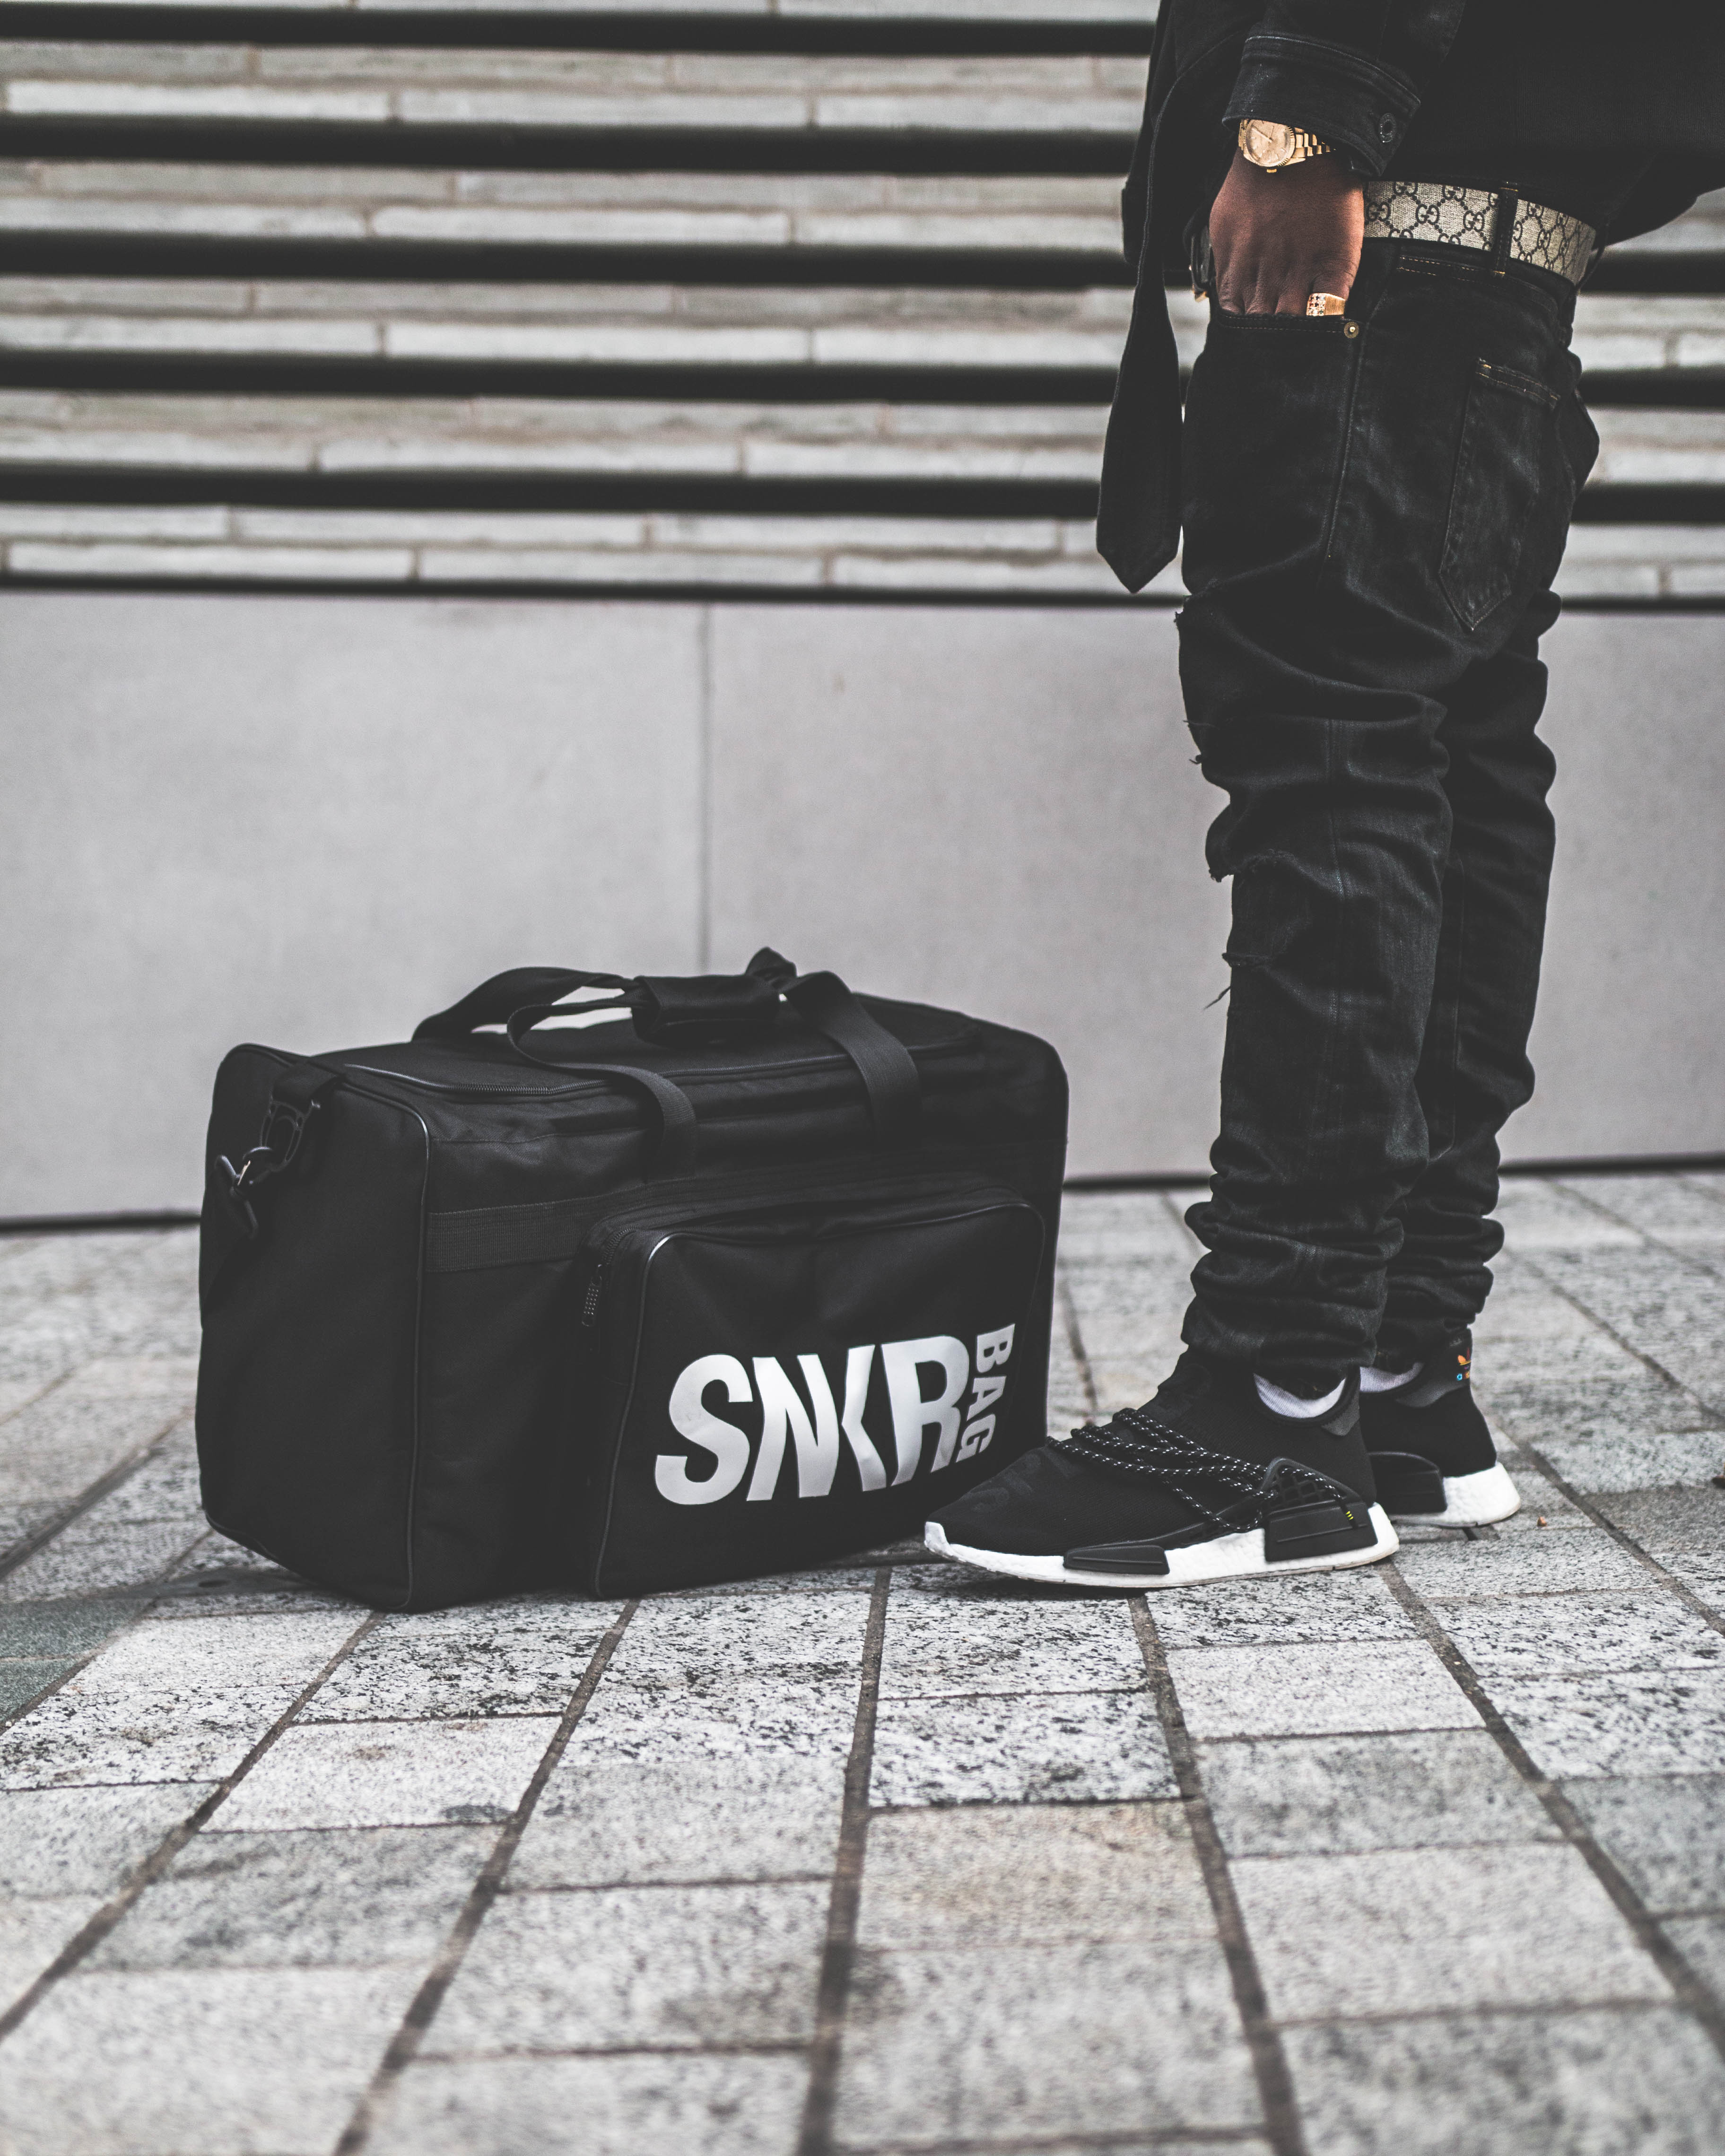 snkr bag by sneaker myth release info sneaker myth